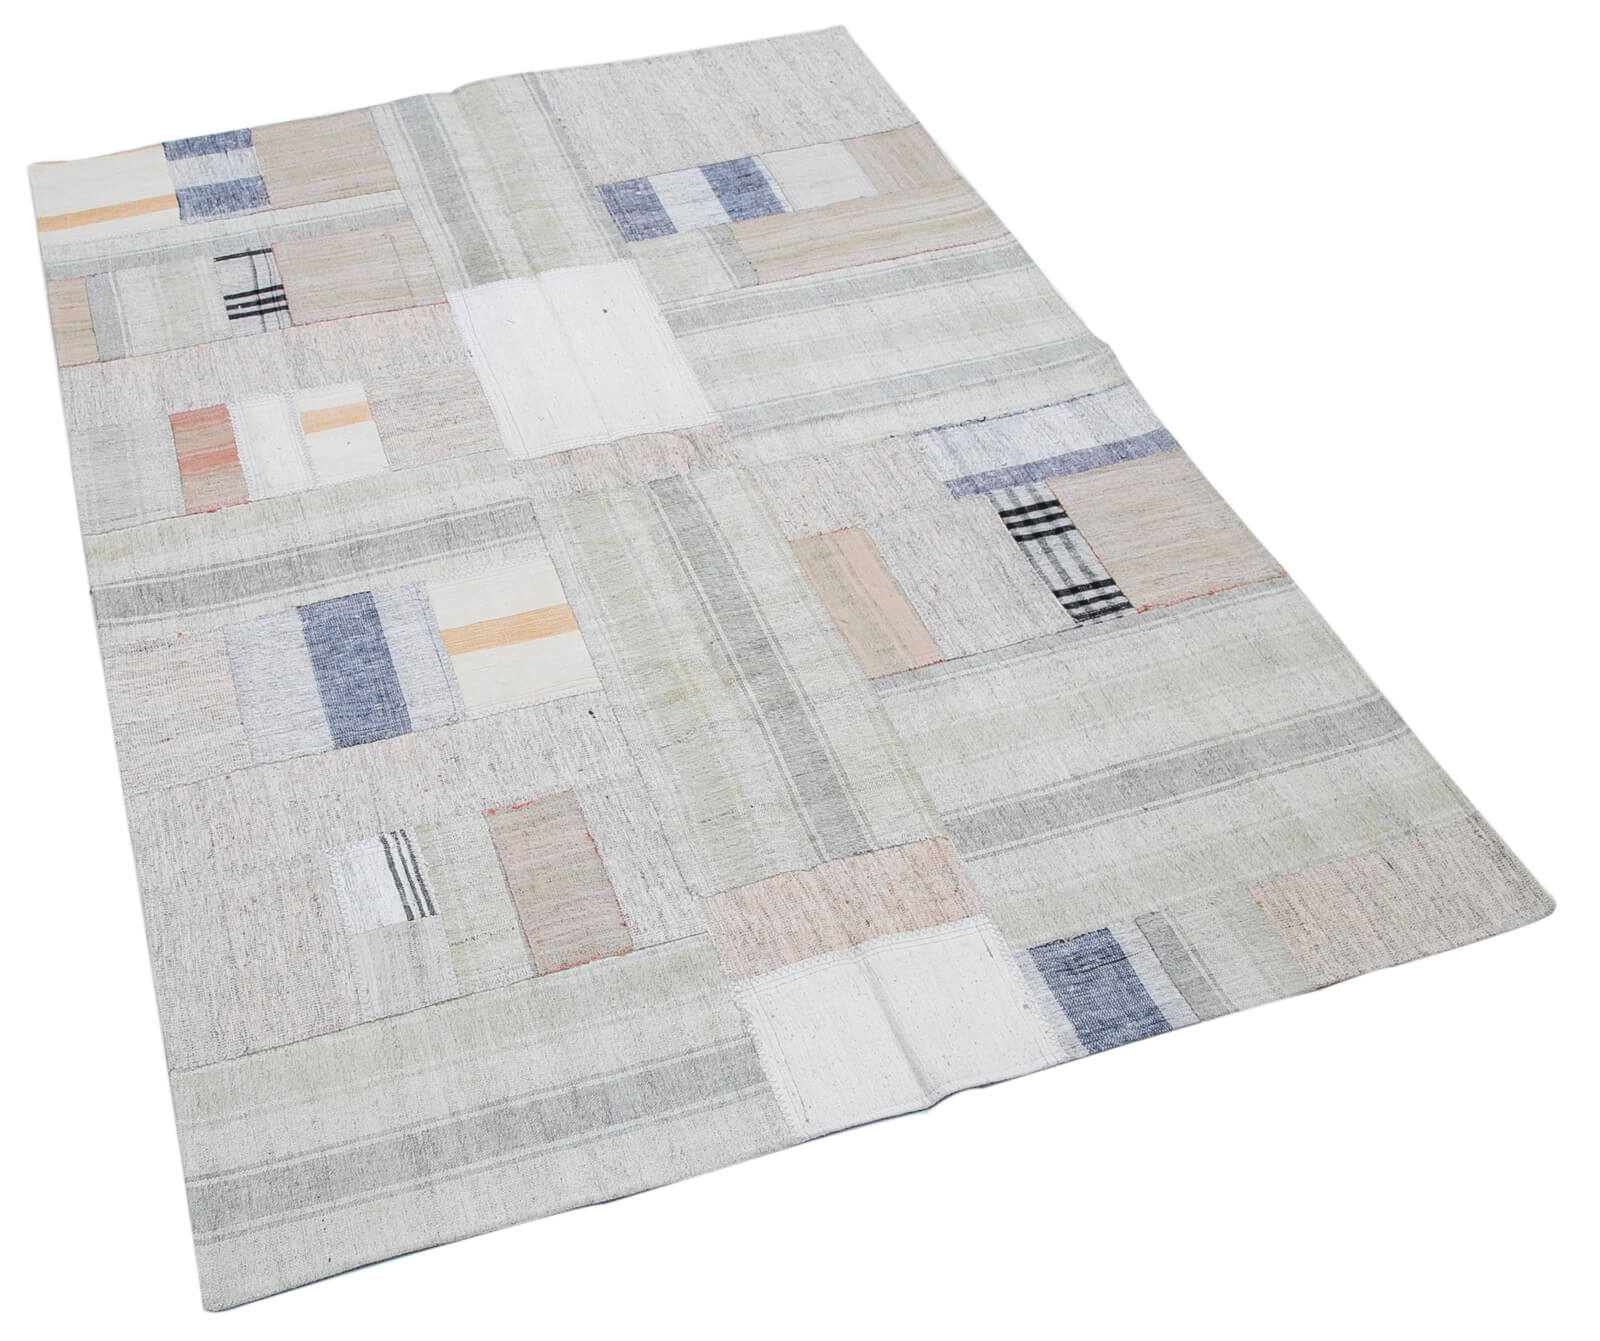 126x181 Cm Beige Handmade Rugs Patchwork Rug-4x6 Ft